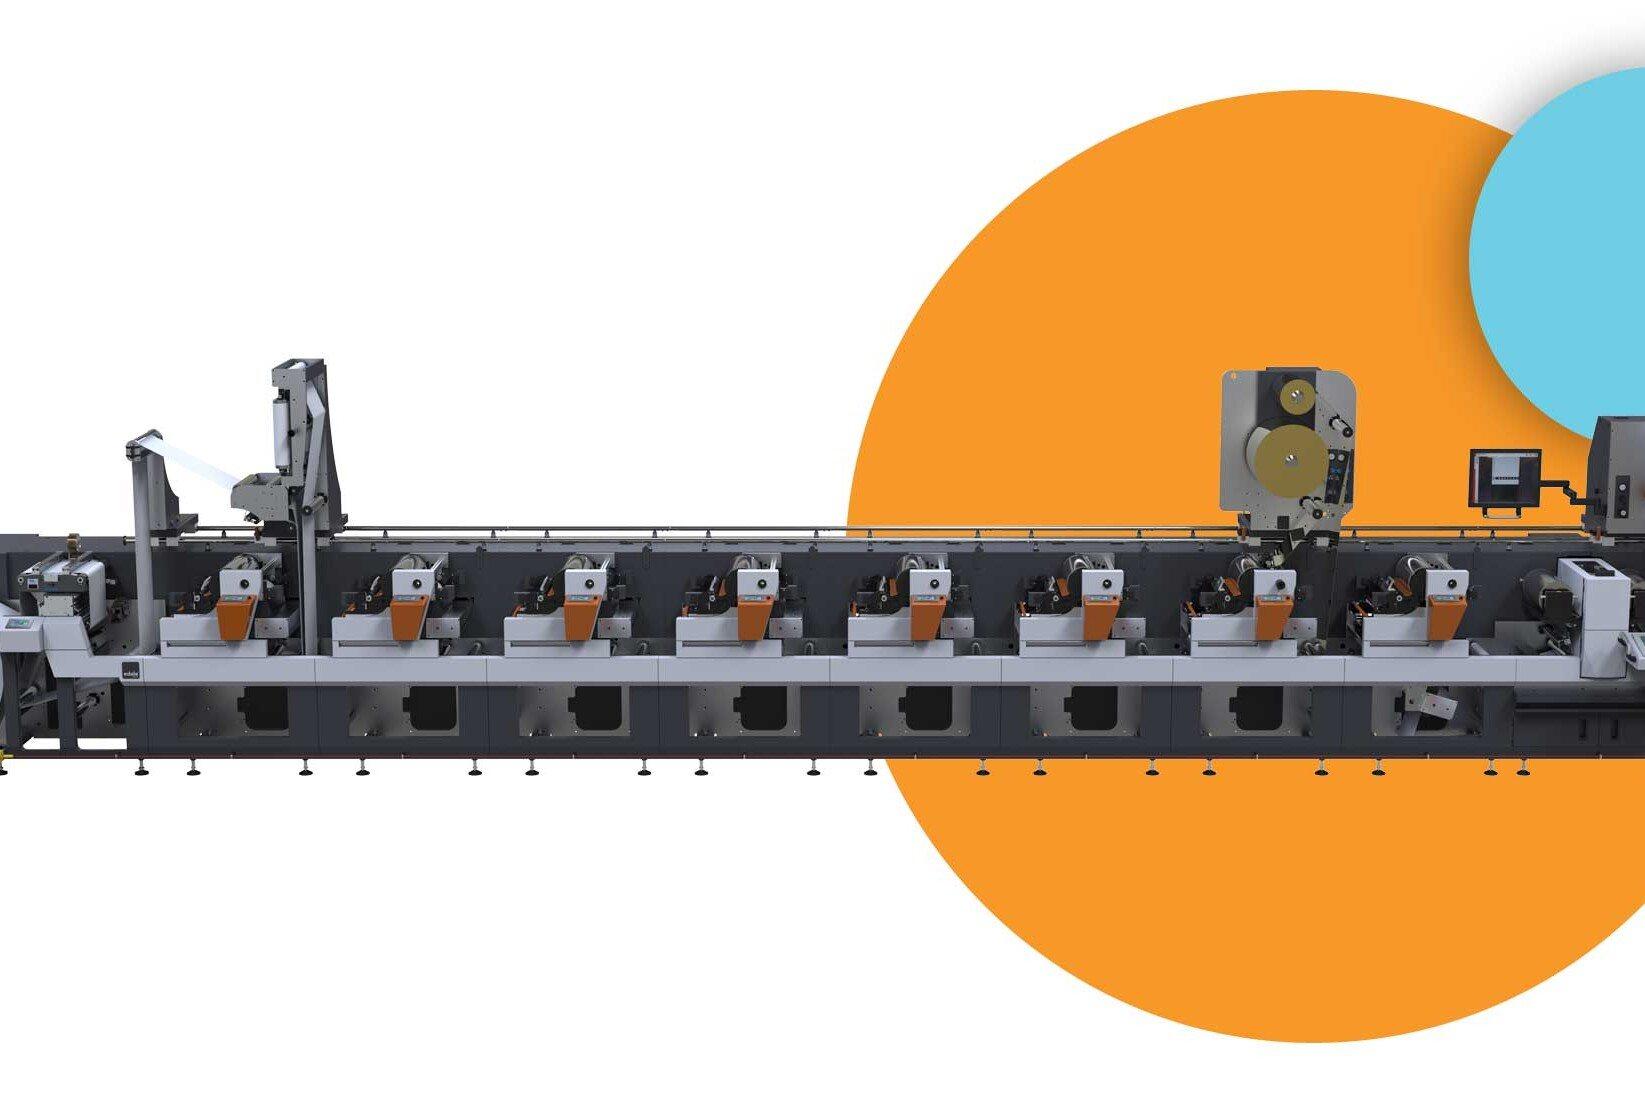 gravure printing machine and flexographic label press